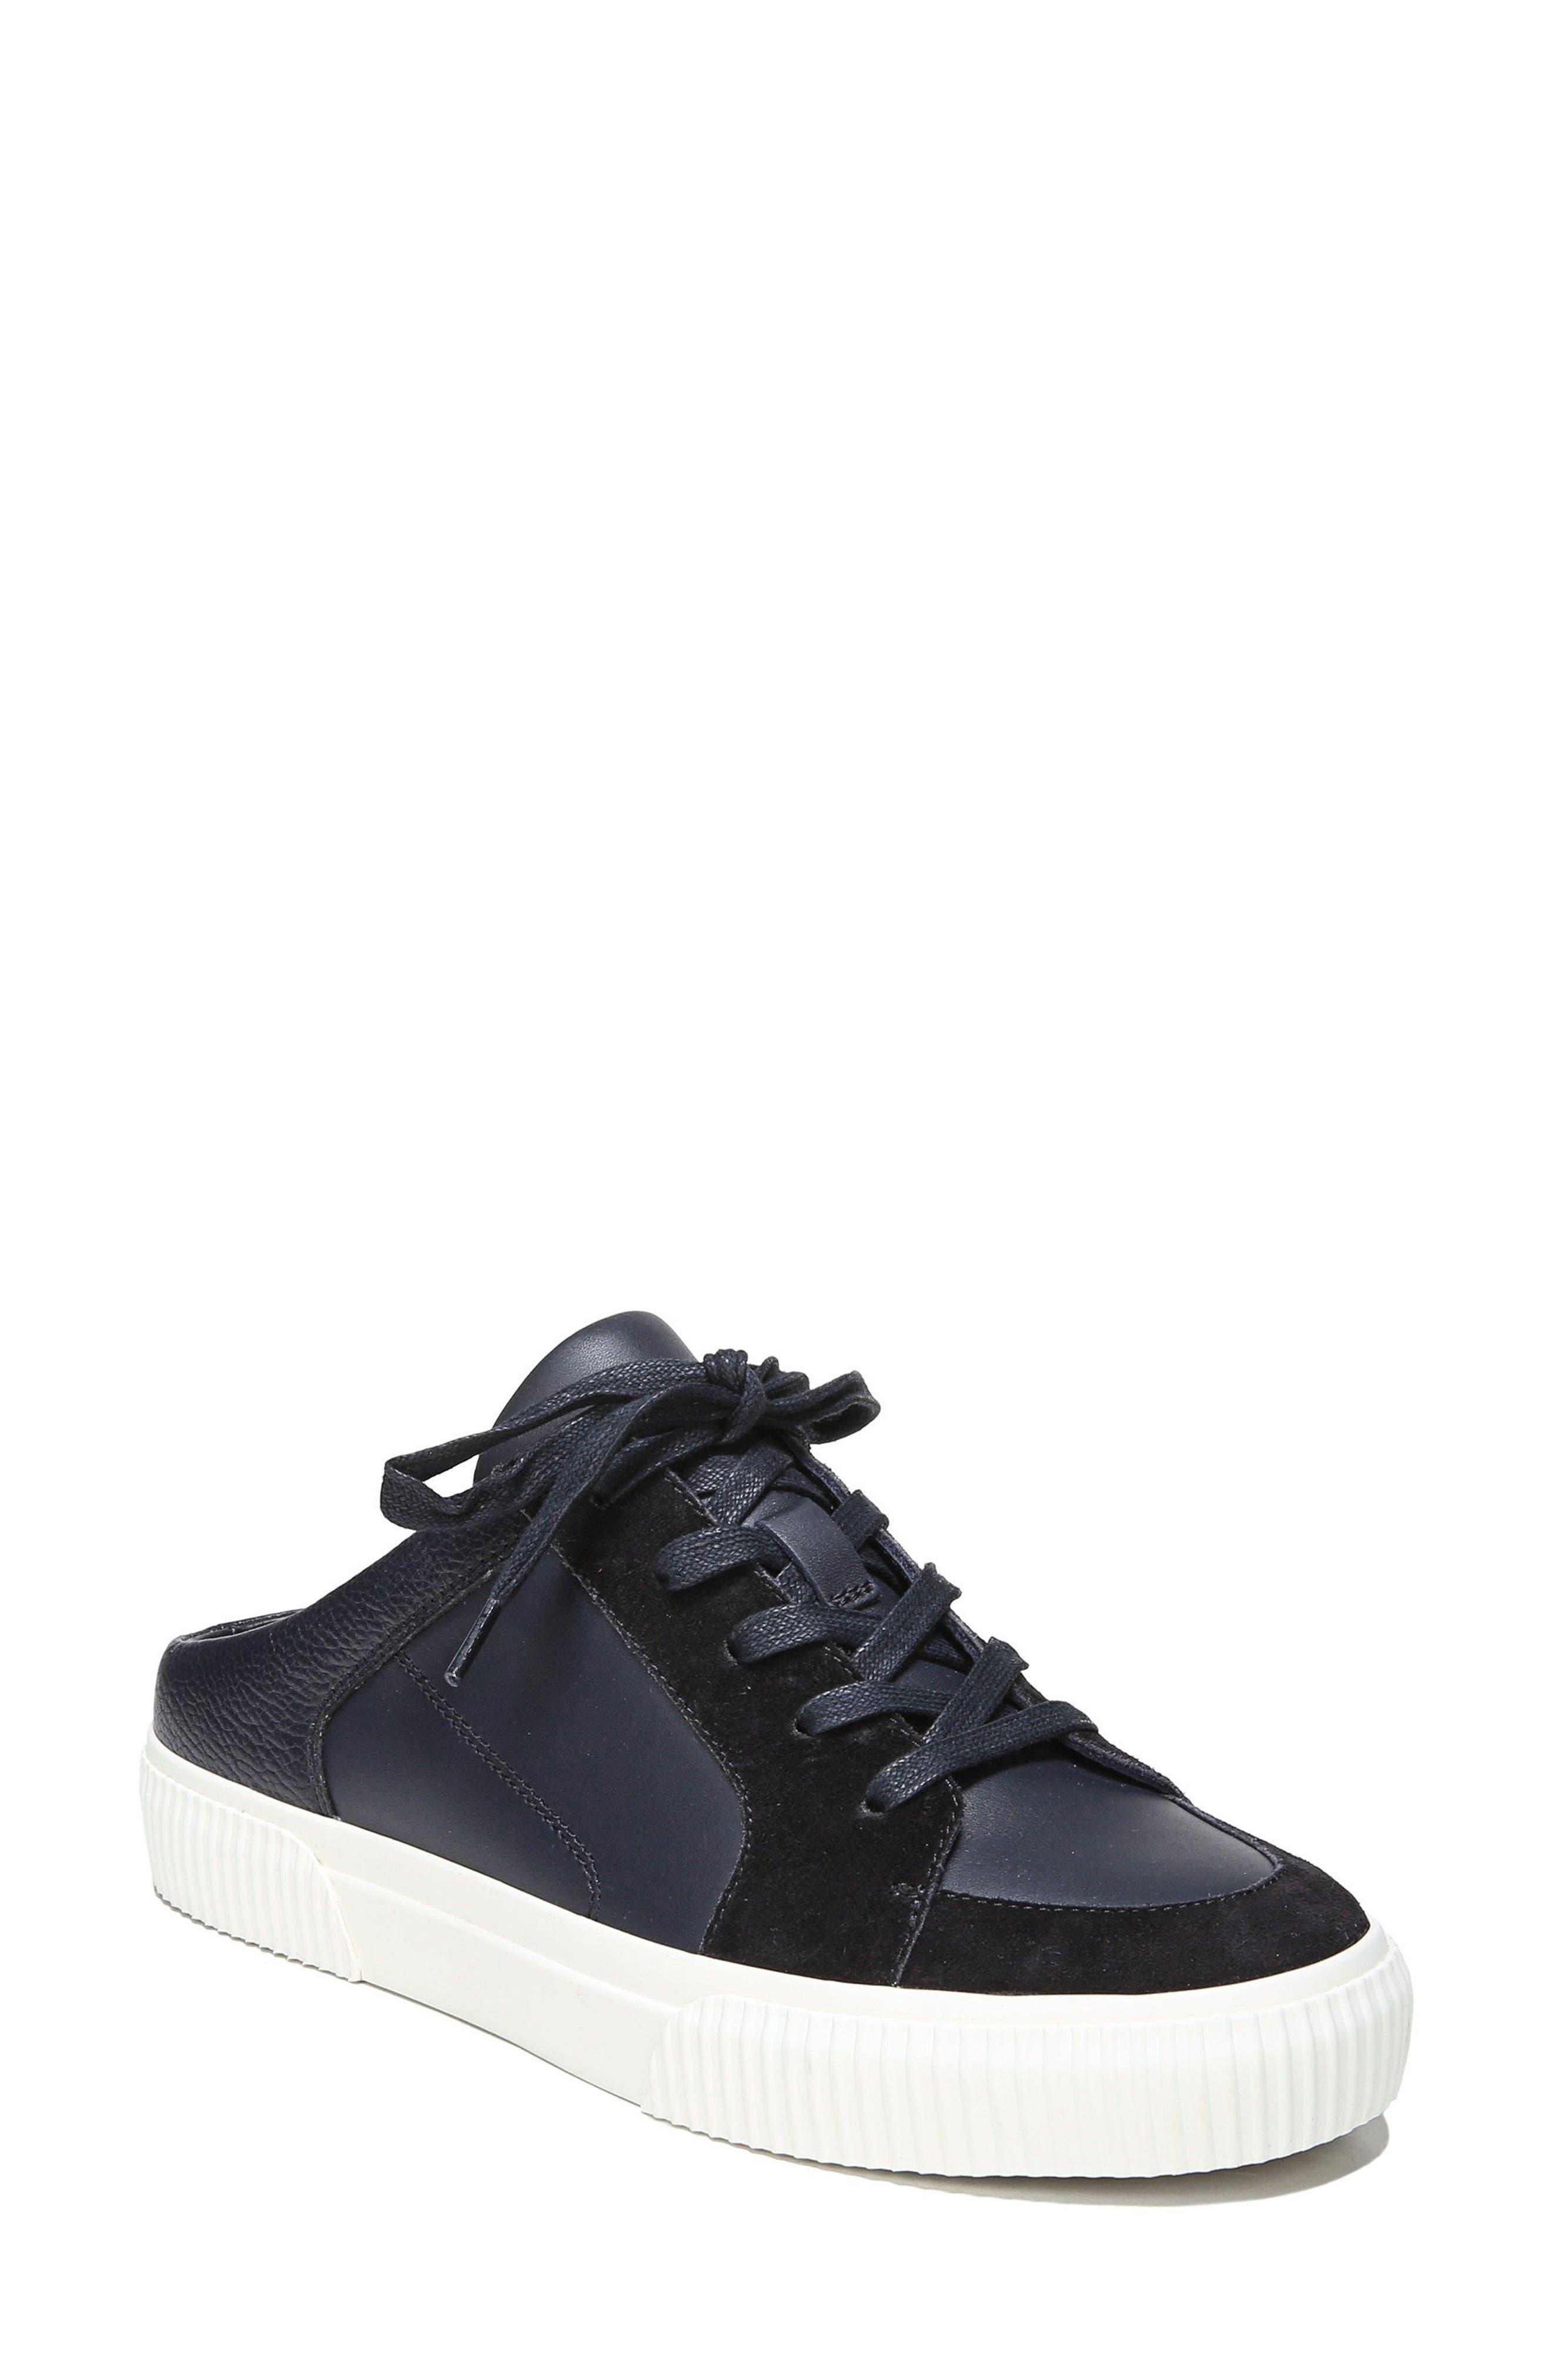 Kess Slip-On Sneaker,                             Main thumbnail 1, color,                             Coastal